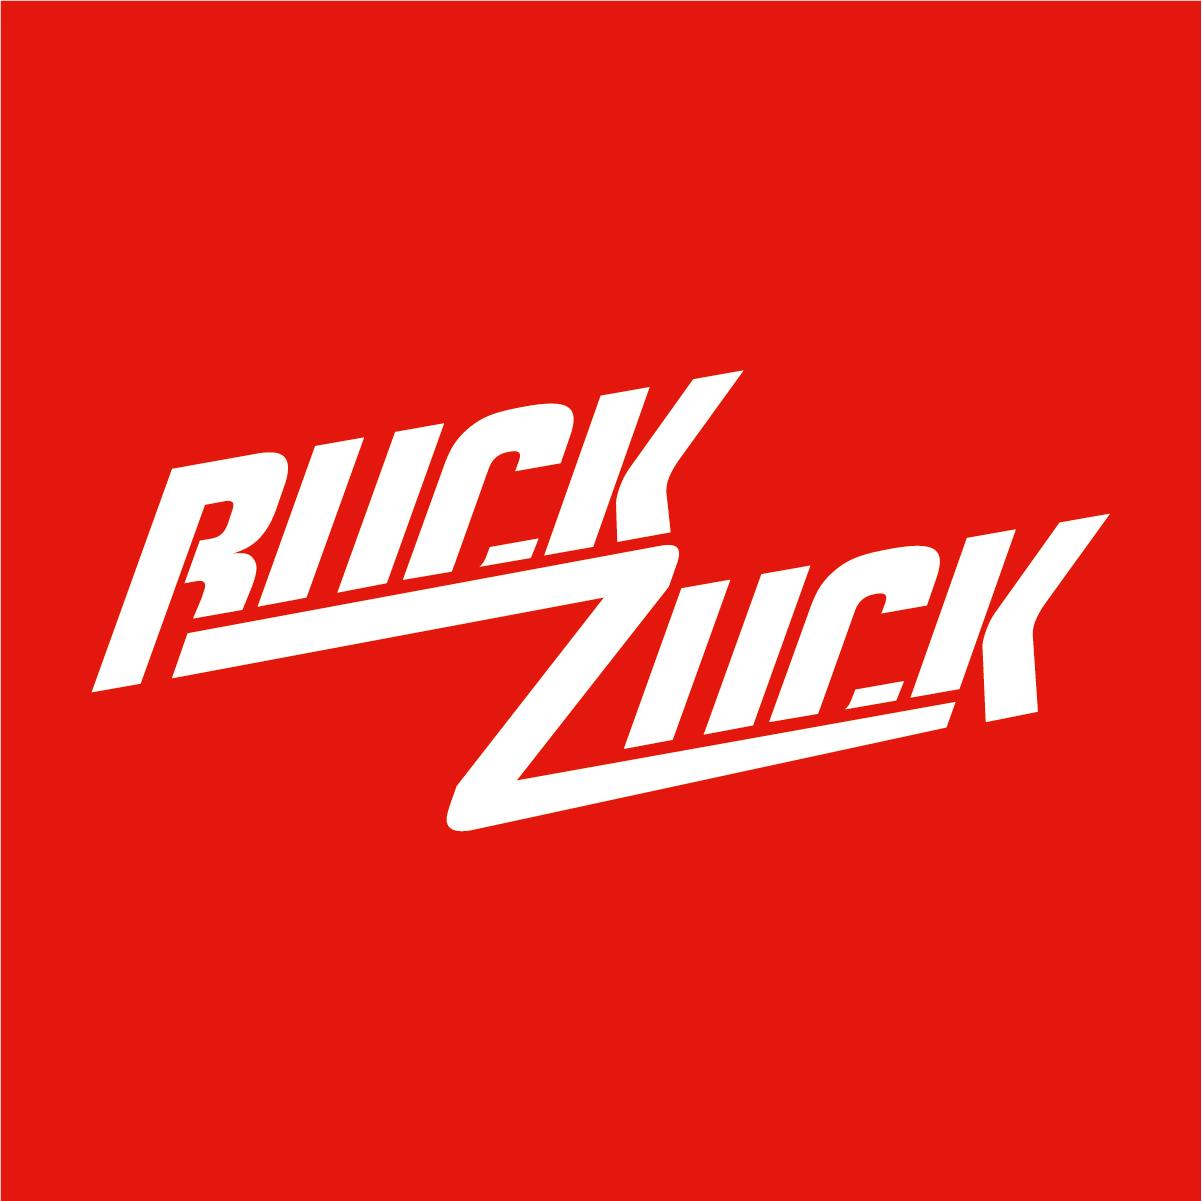 MUSTER CERAMIN VARIO 3mm Fliese x-tra breit Tadelakt weiss PVC-frei